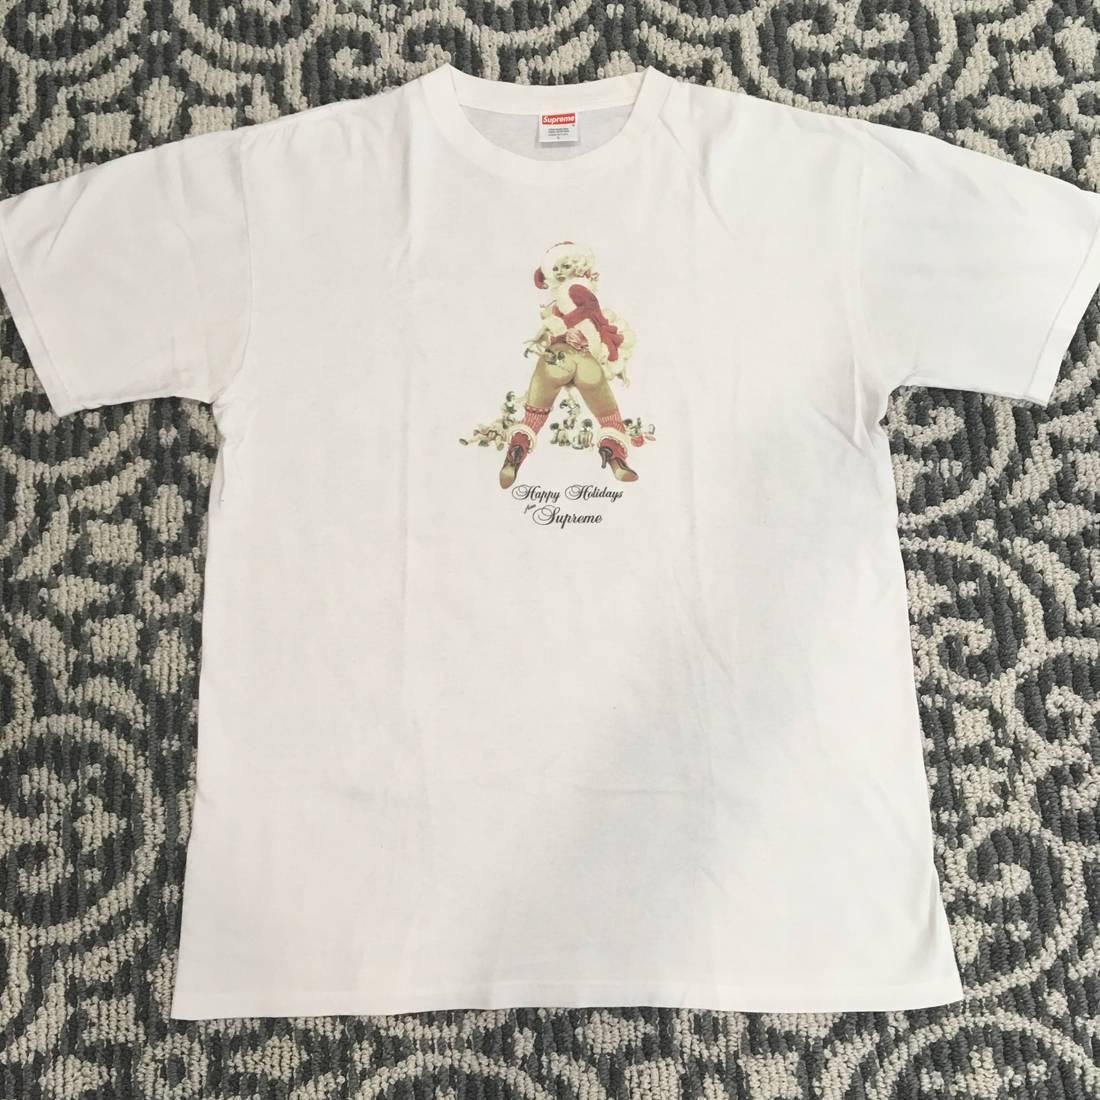 cheap christmas shirts for family - Cheap Christmas Shirts